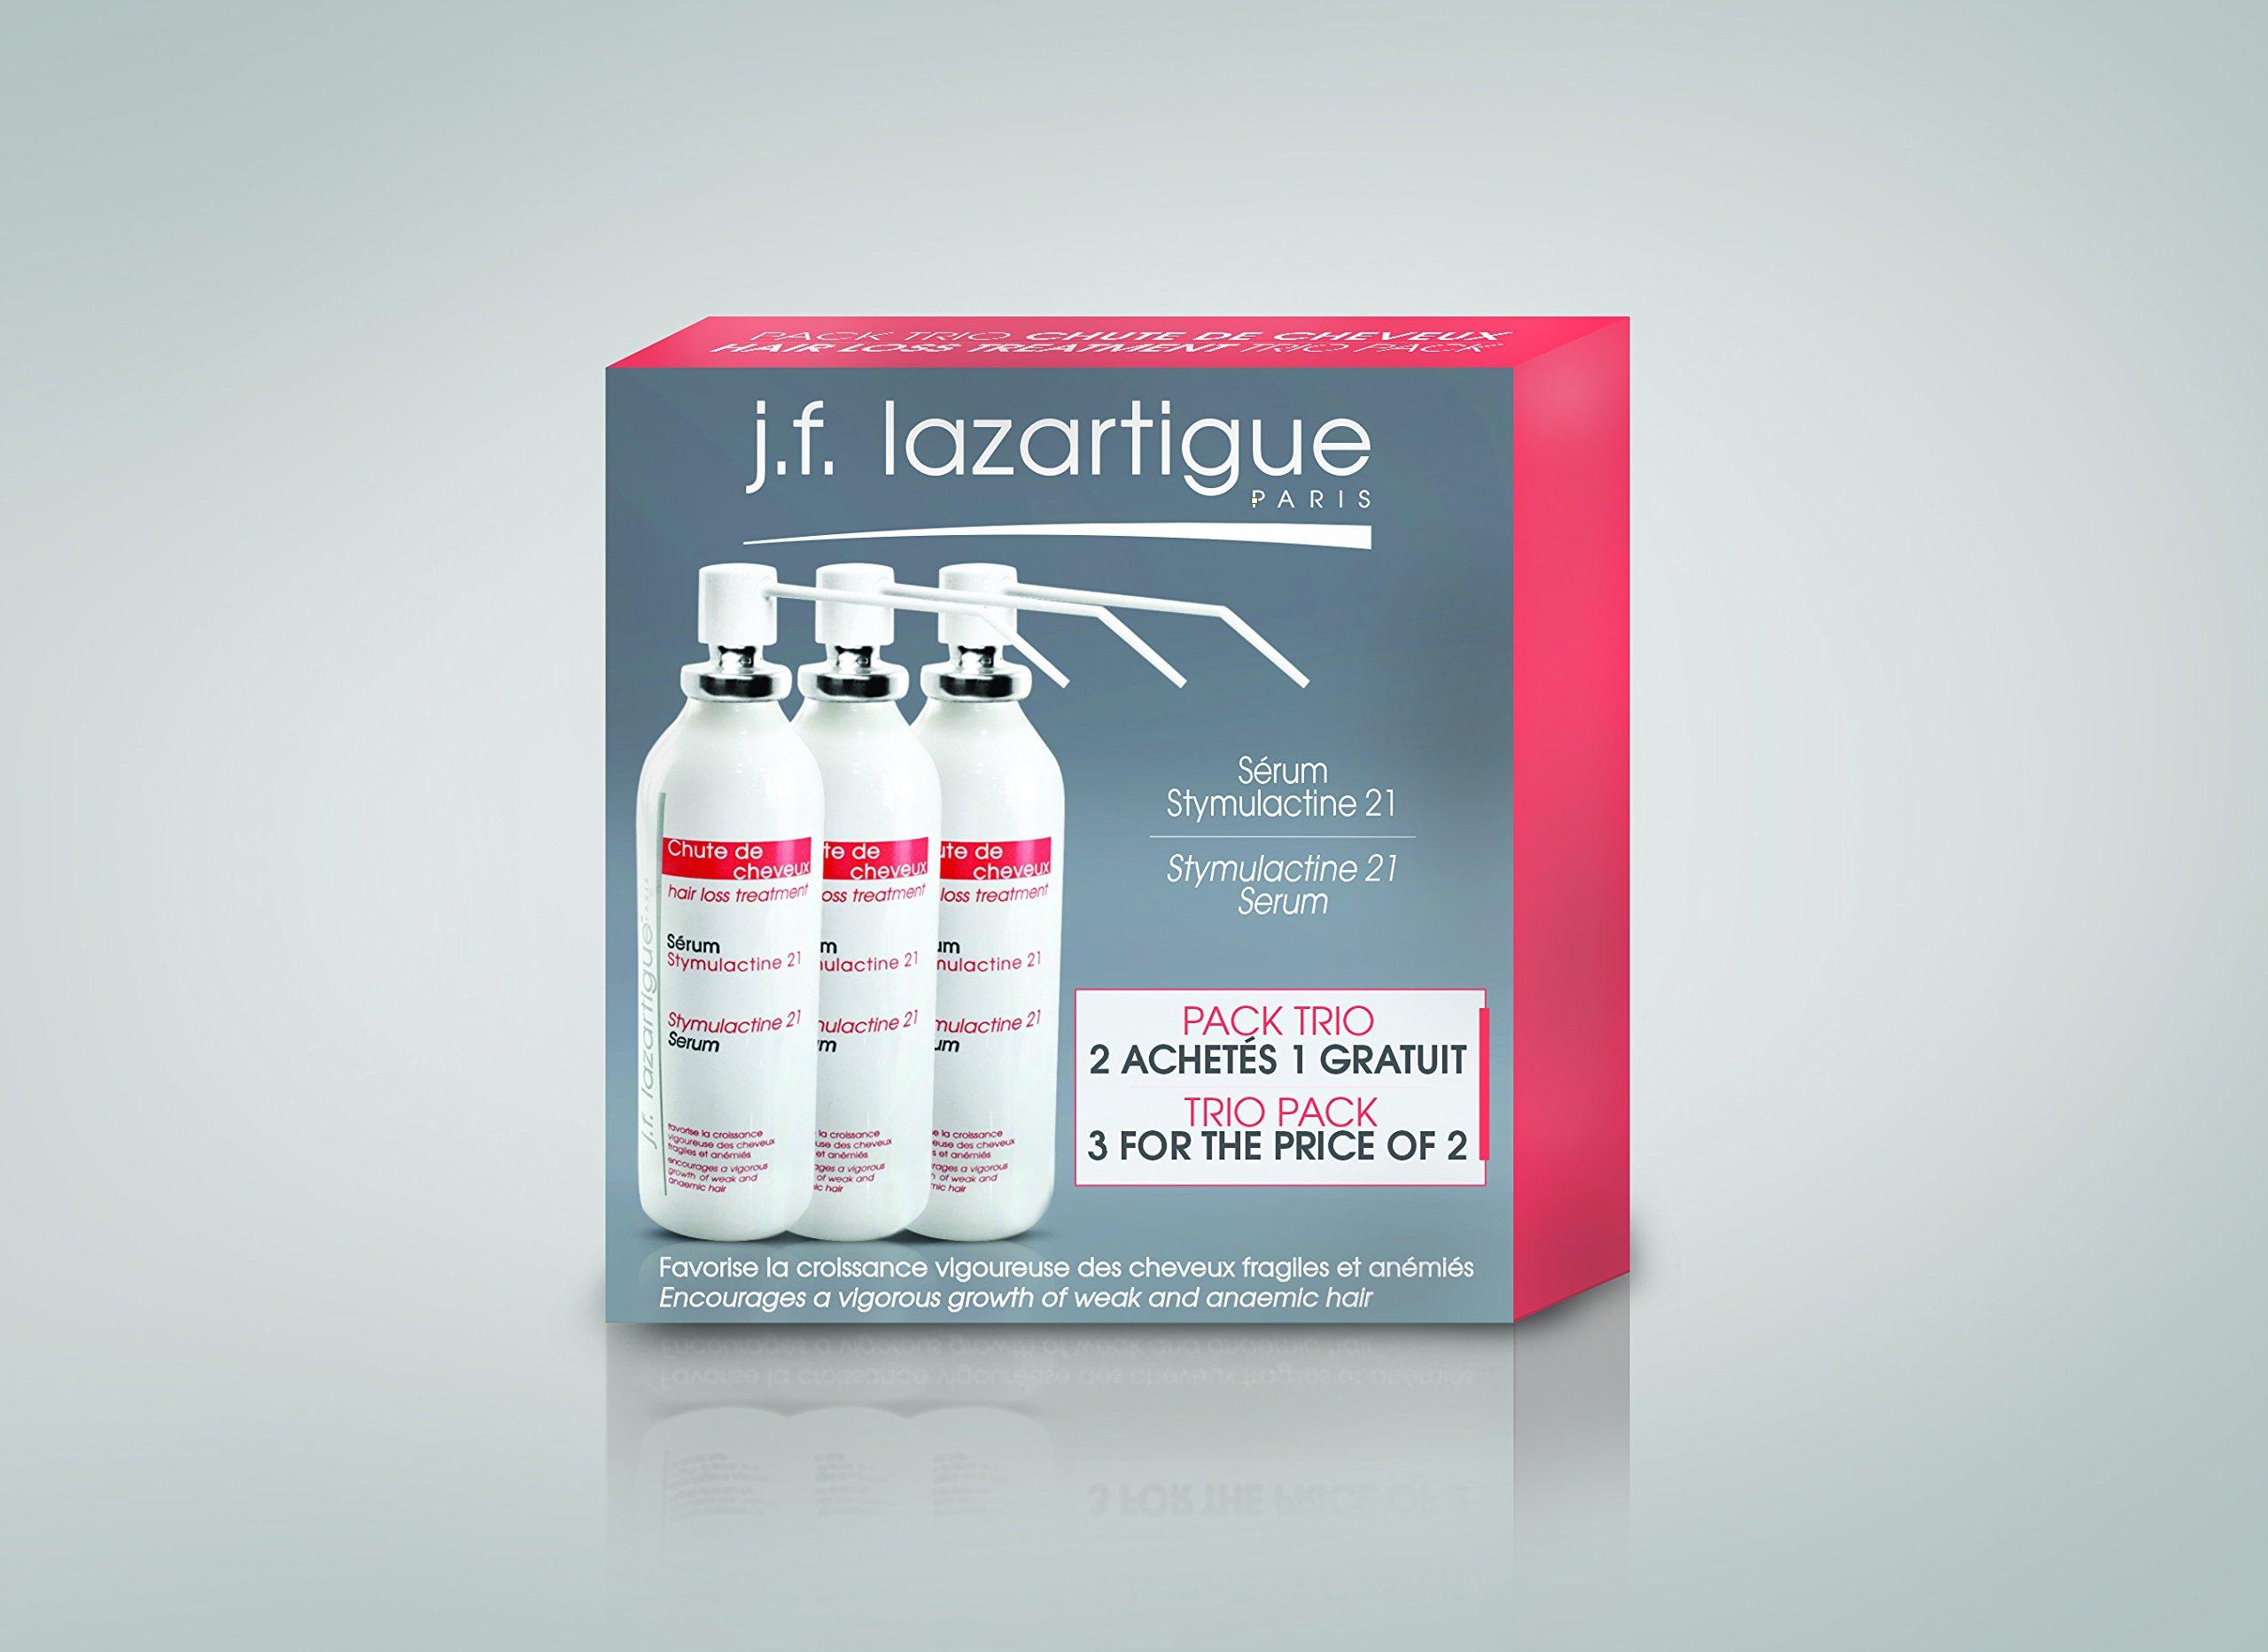 J.F. Lazartigue Stymulactine 21 Spray Serum Hair regrowth Trio Pack